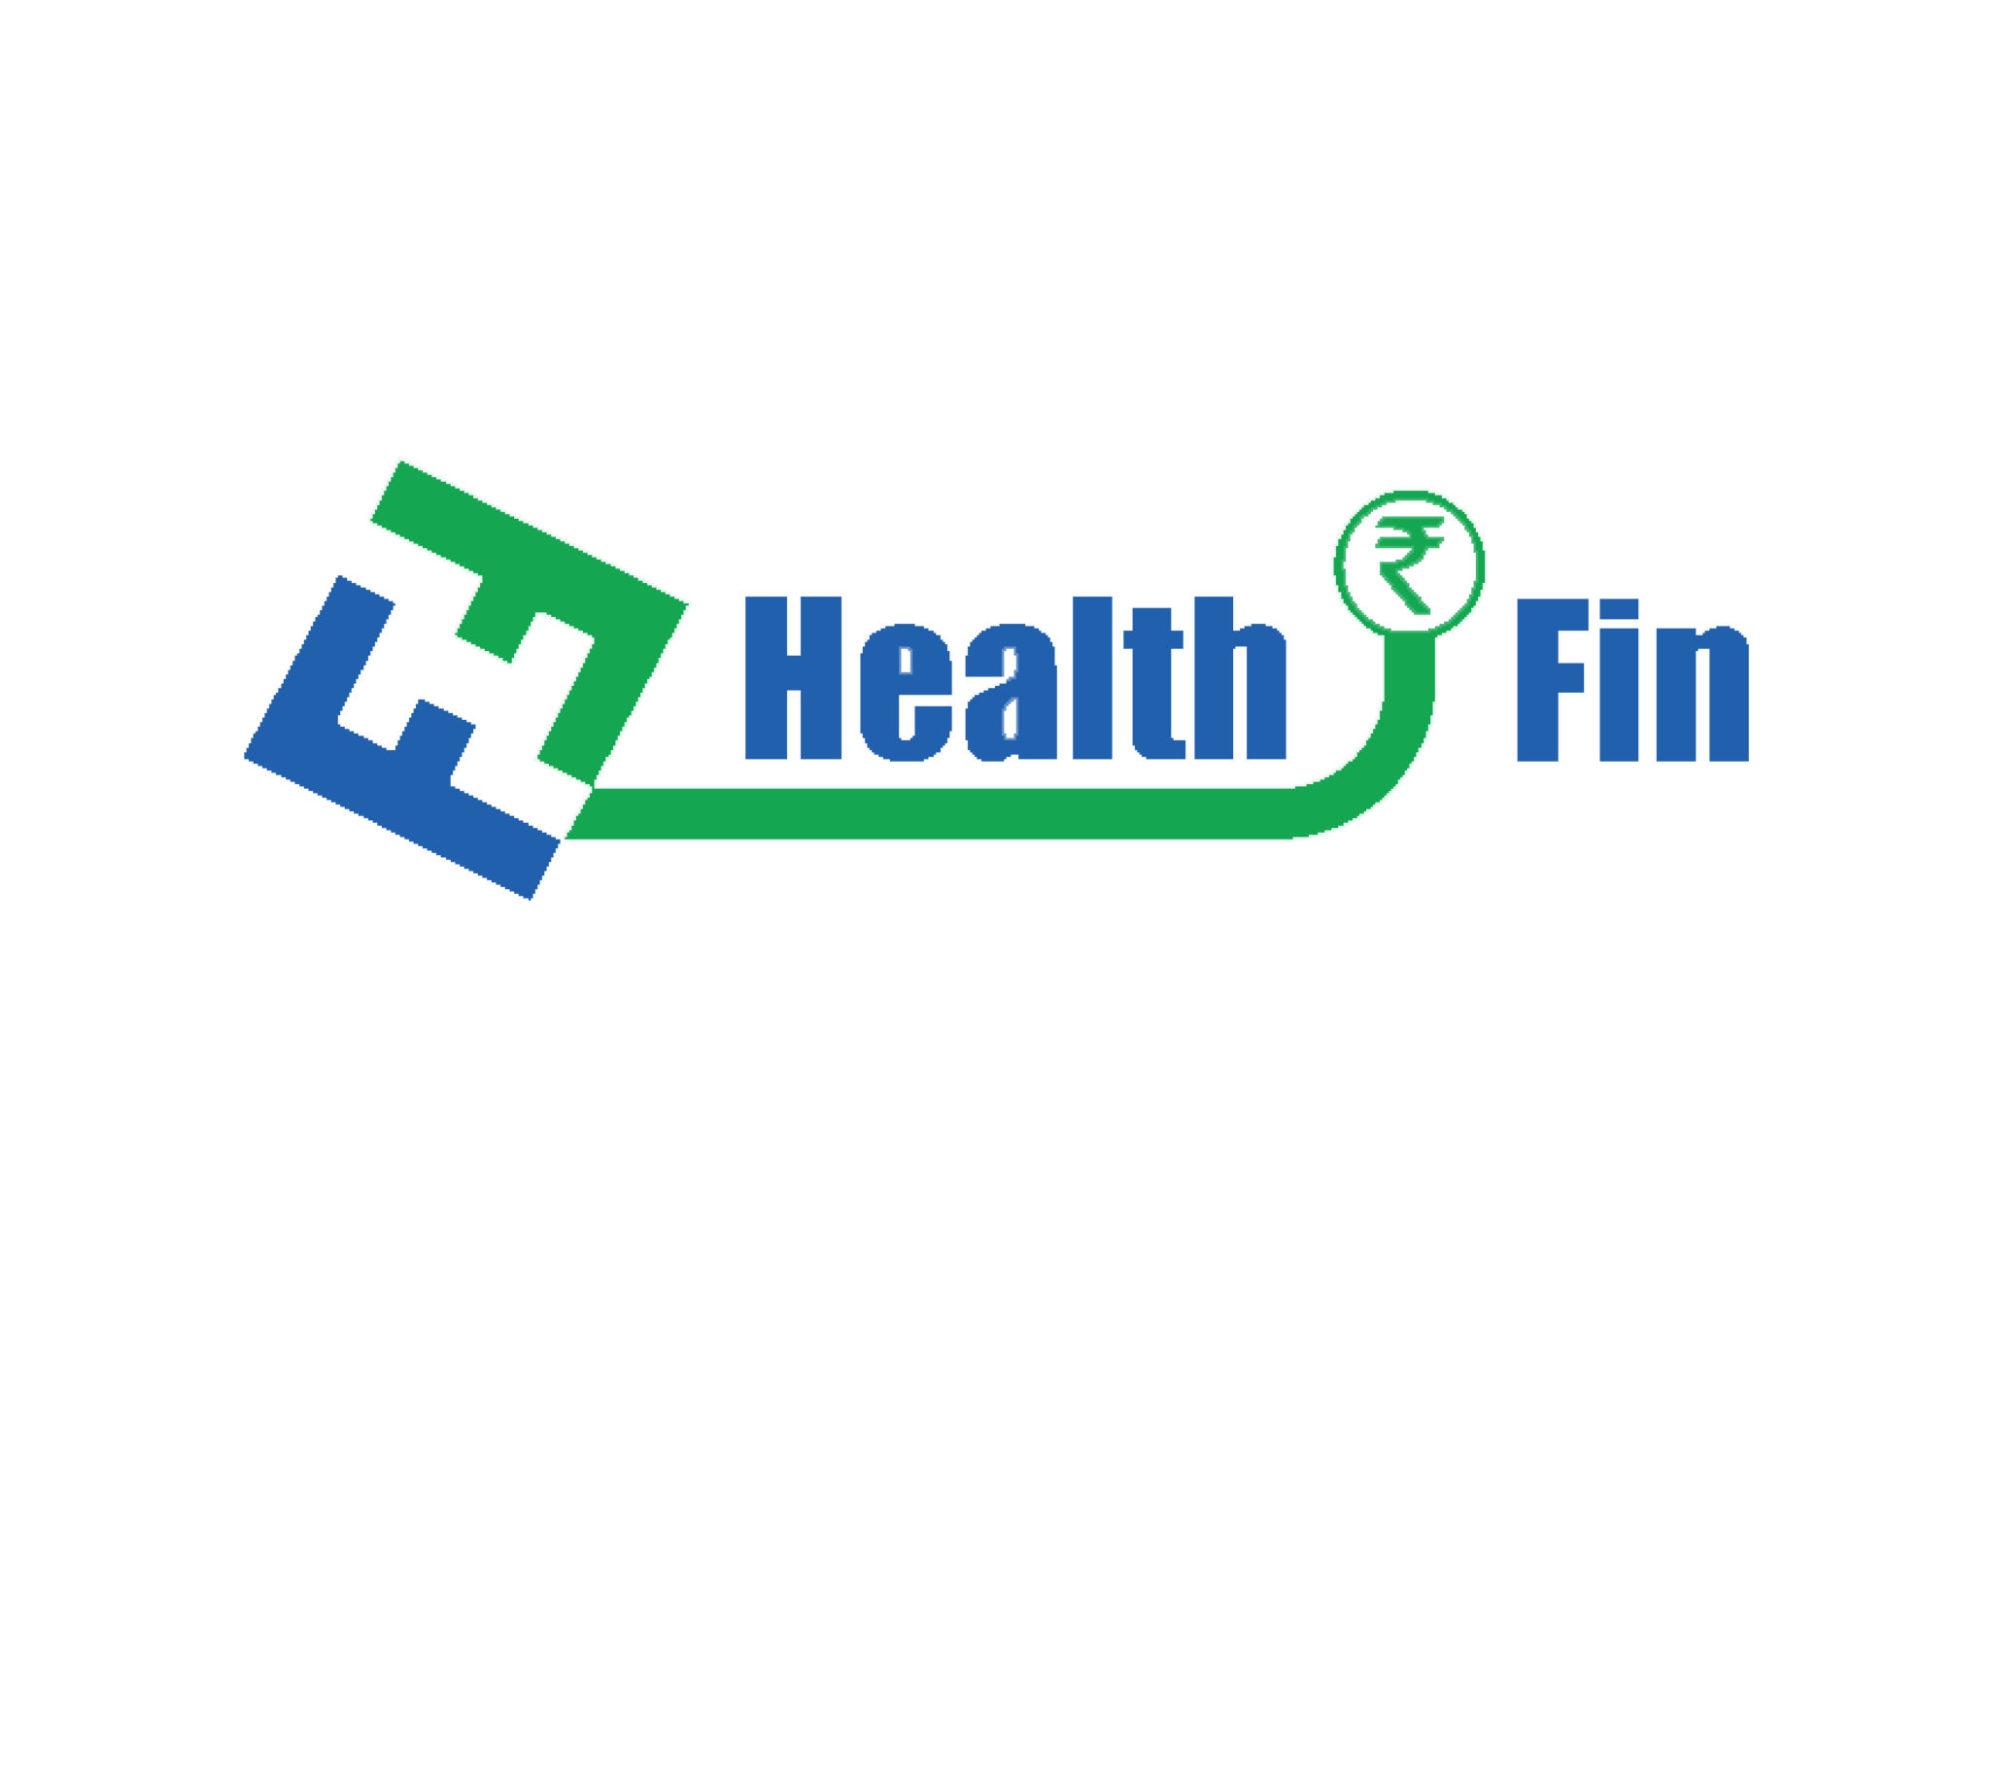 Healthfin